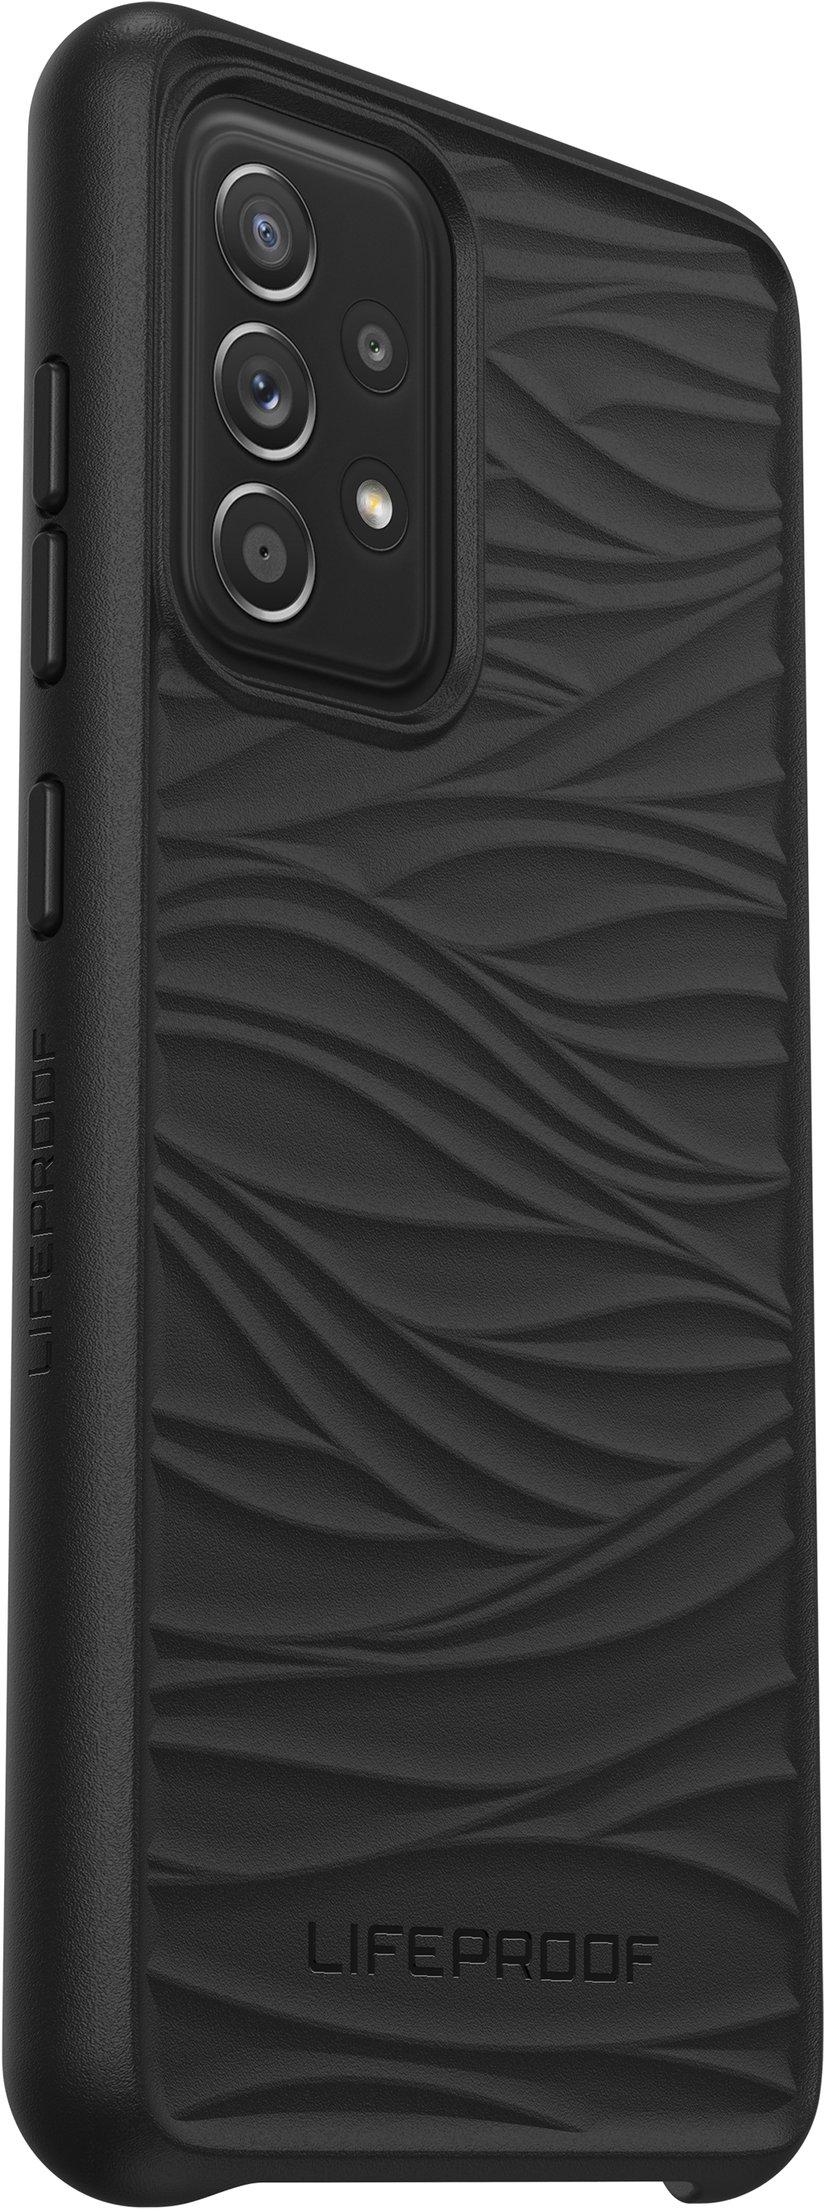 Otterbox LifeProof WAKE Samsung Galaxy A52, Samsung Galaxy A52s Svart